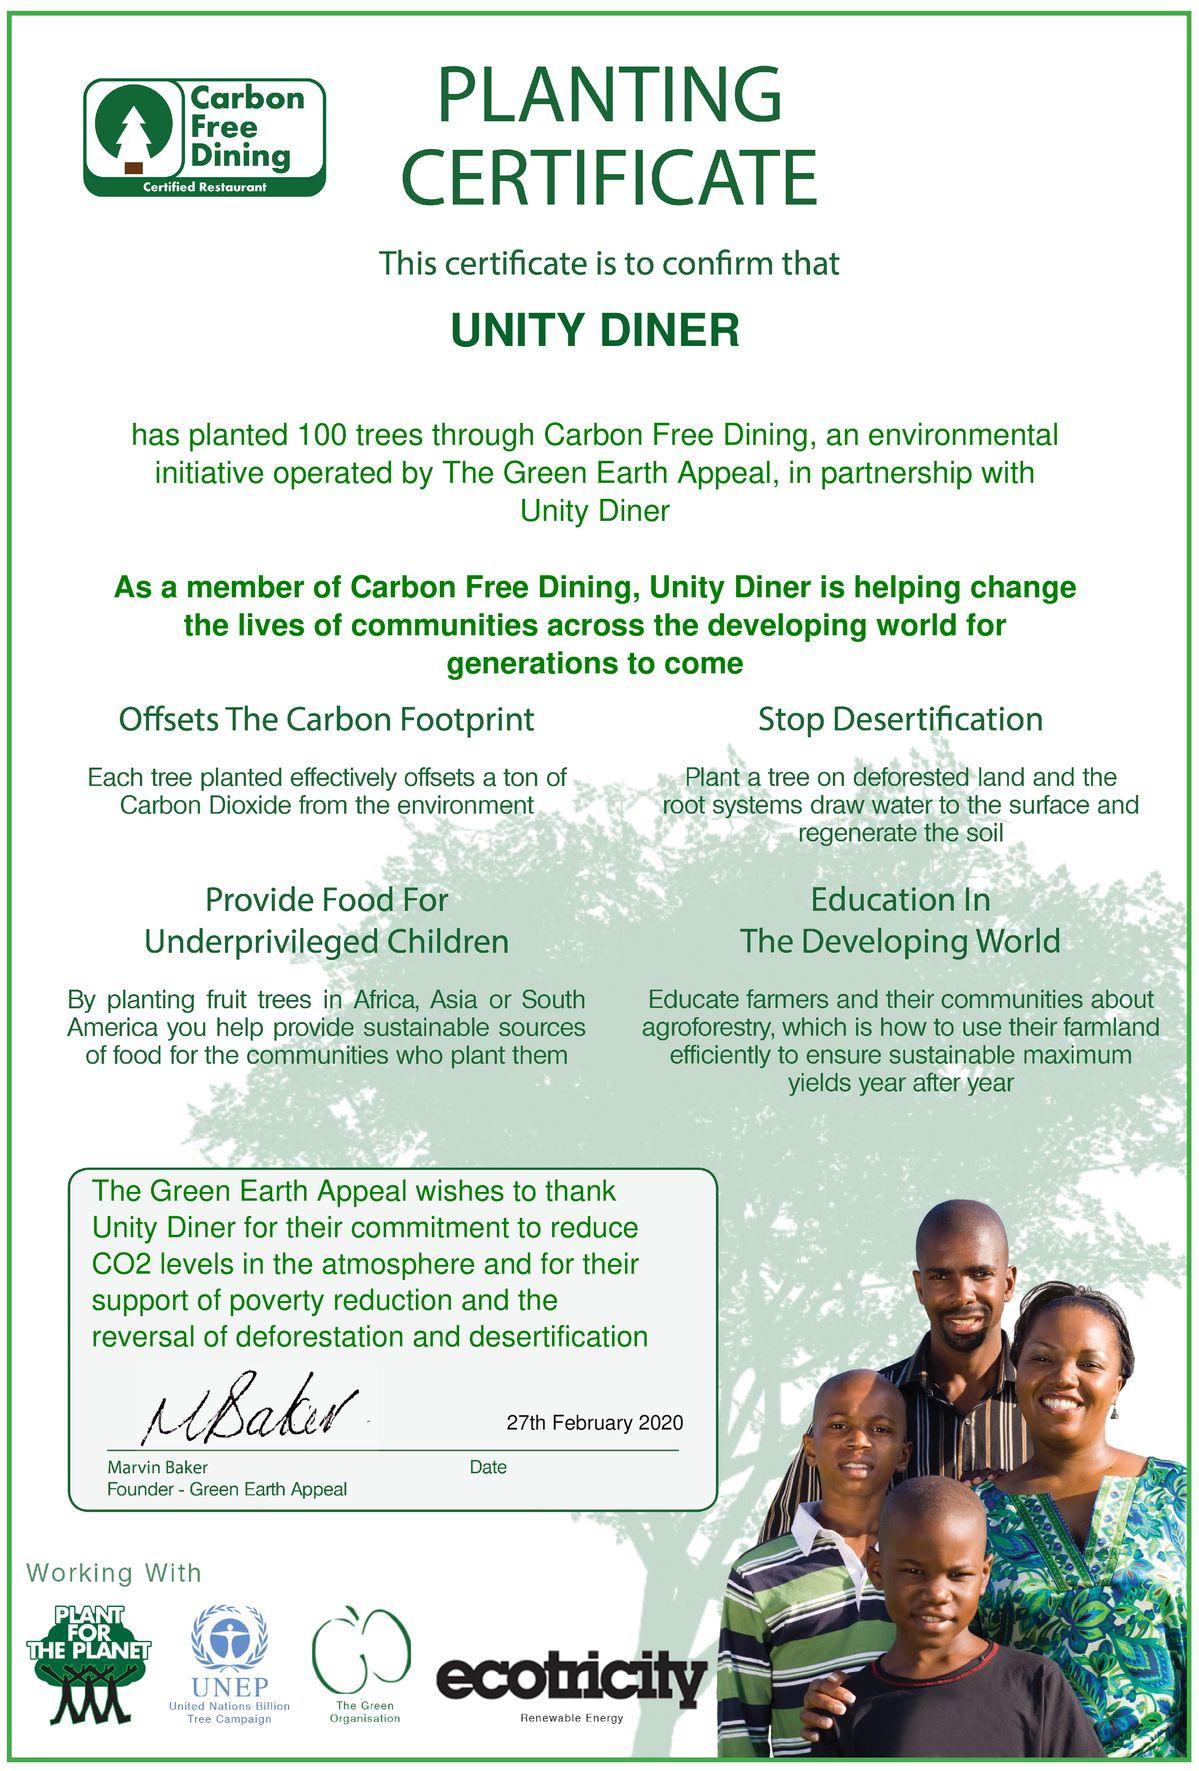 Unity Diner